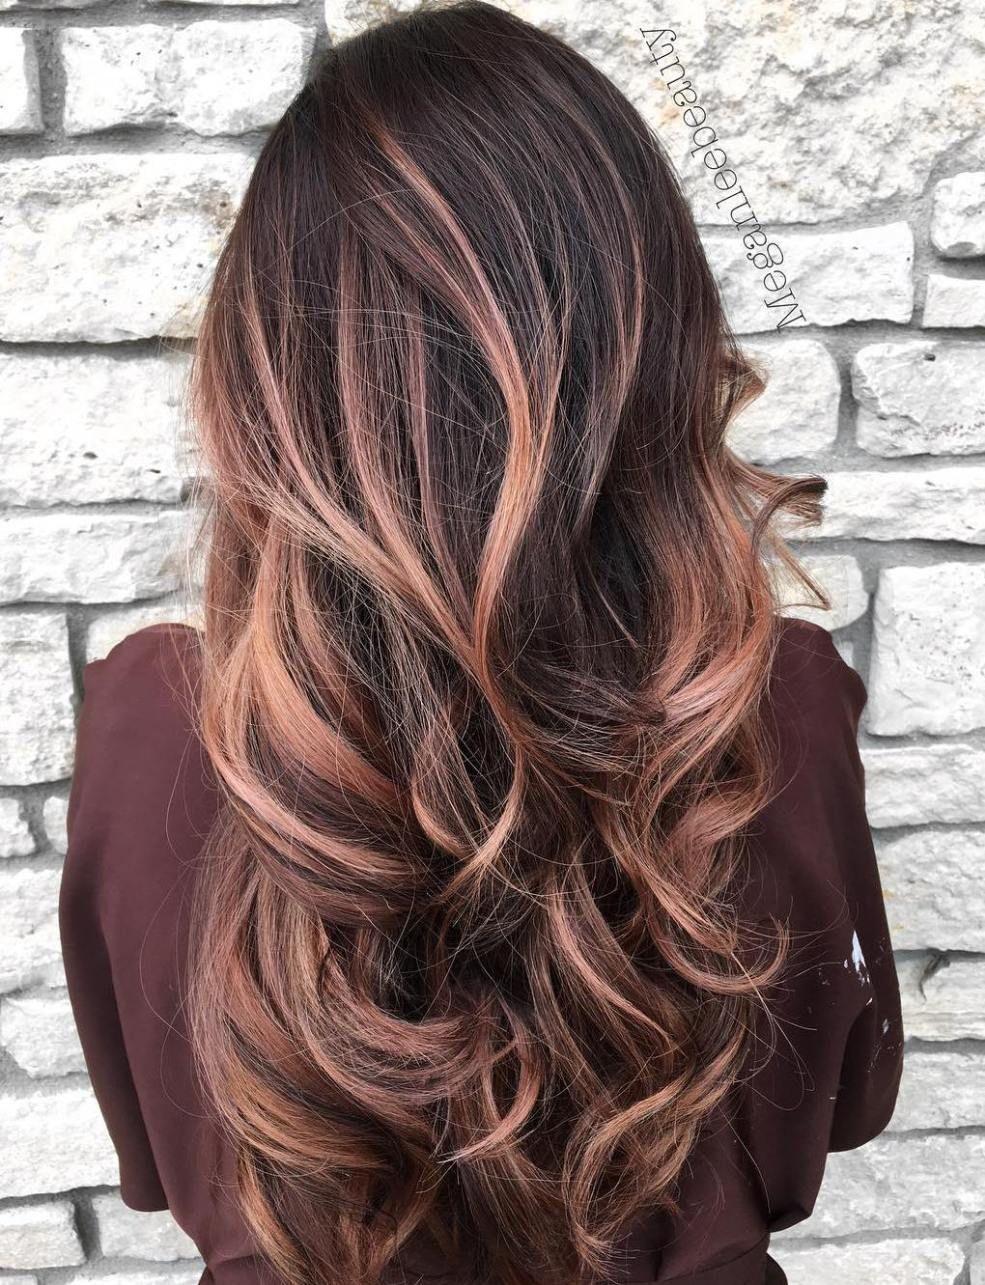 Ballayage Blond dedans 70 flattering balayage hair color ideas for 2018 | rose gold